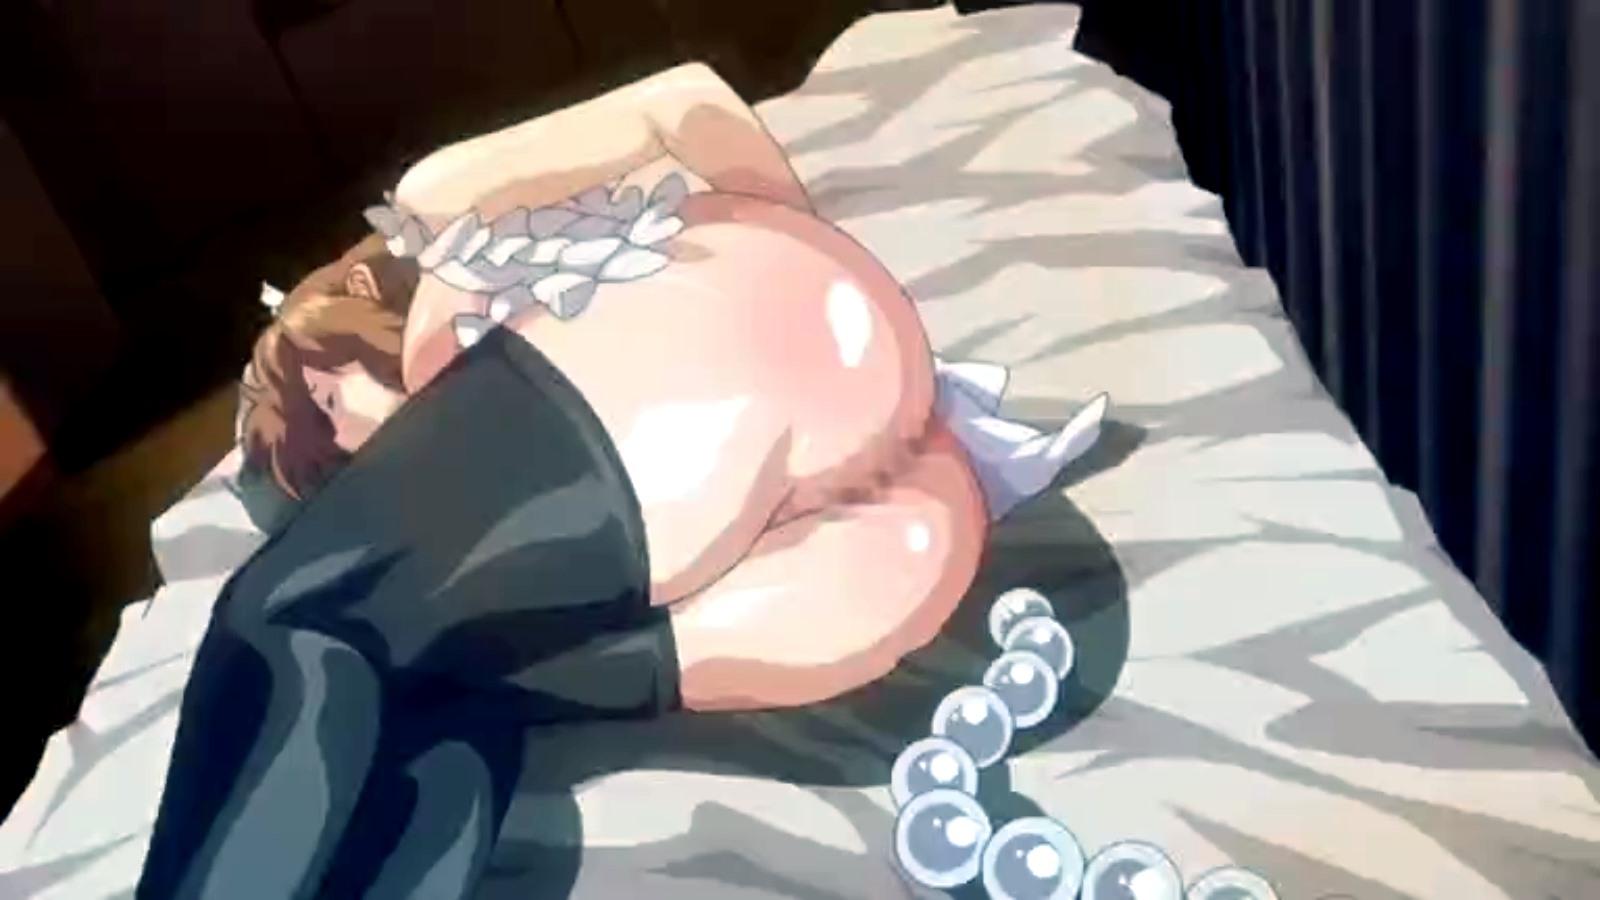 Yarimoku Beach Anime Hentai